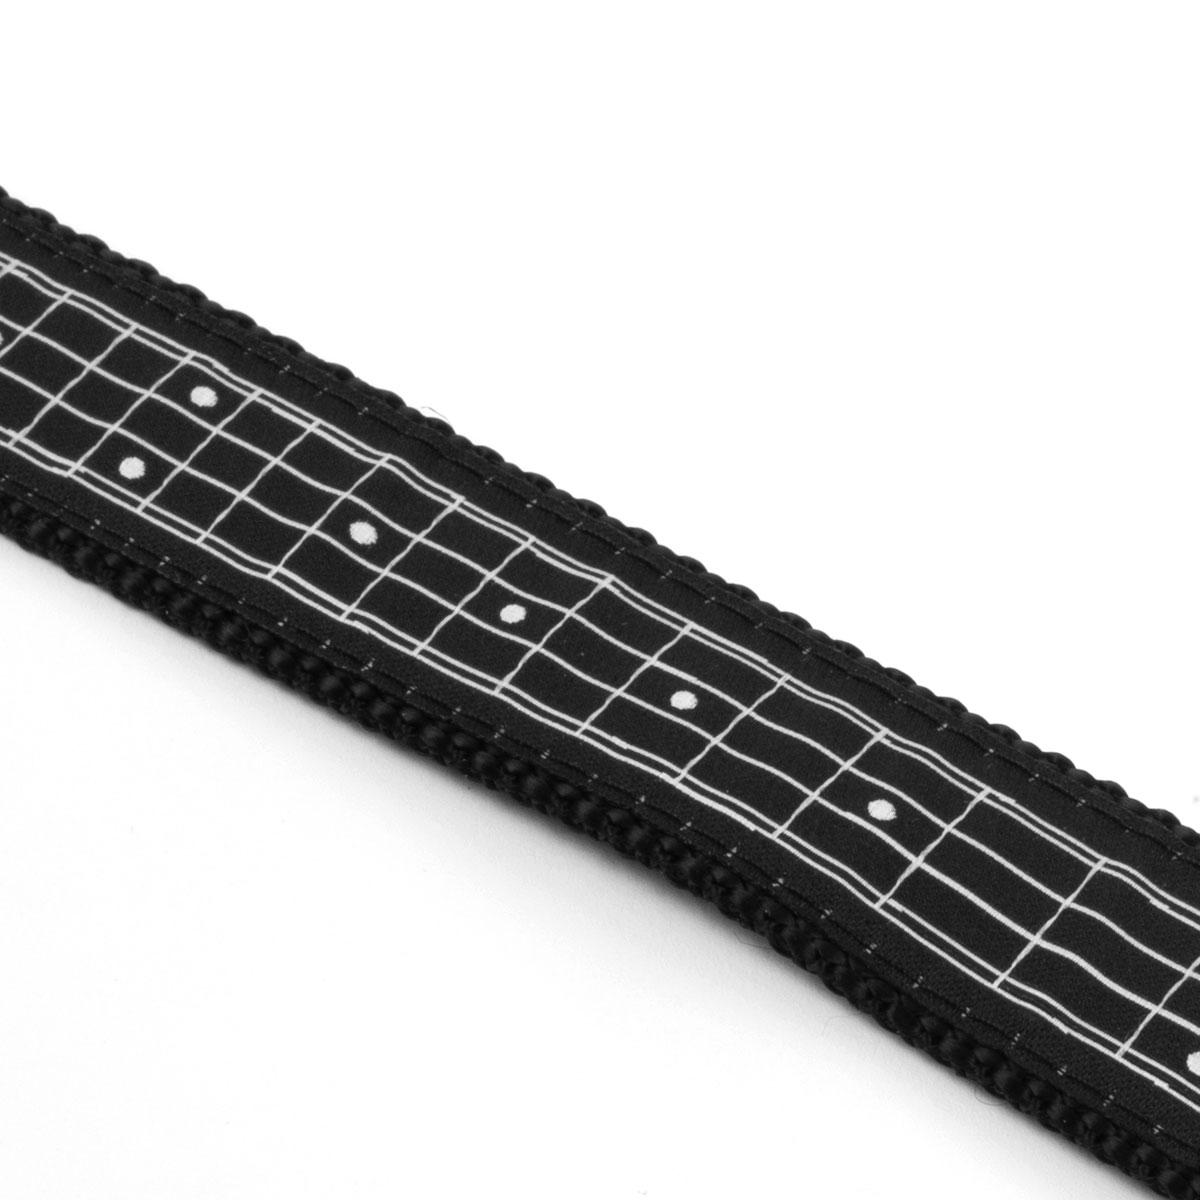 Guitar Fretboard Pet Leash